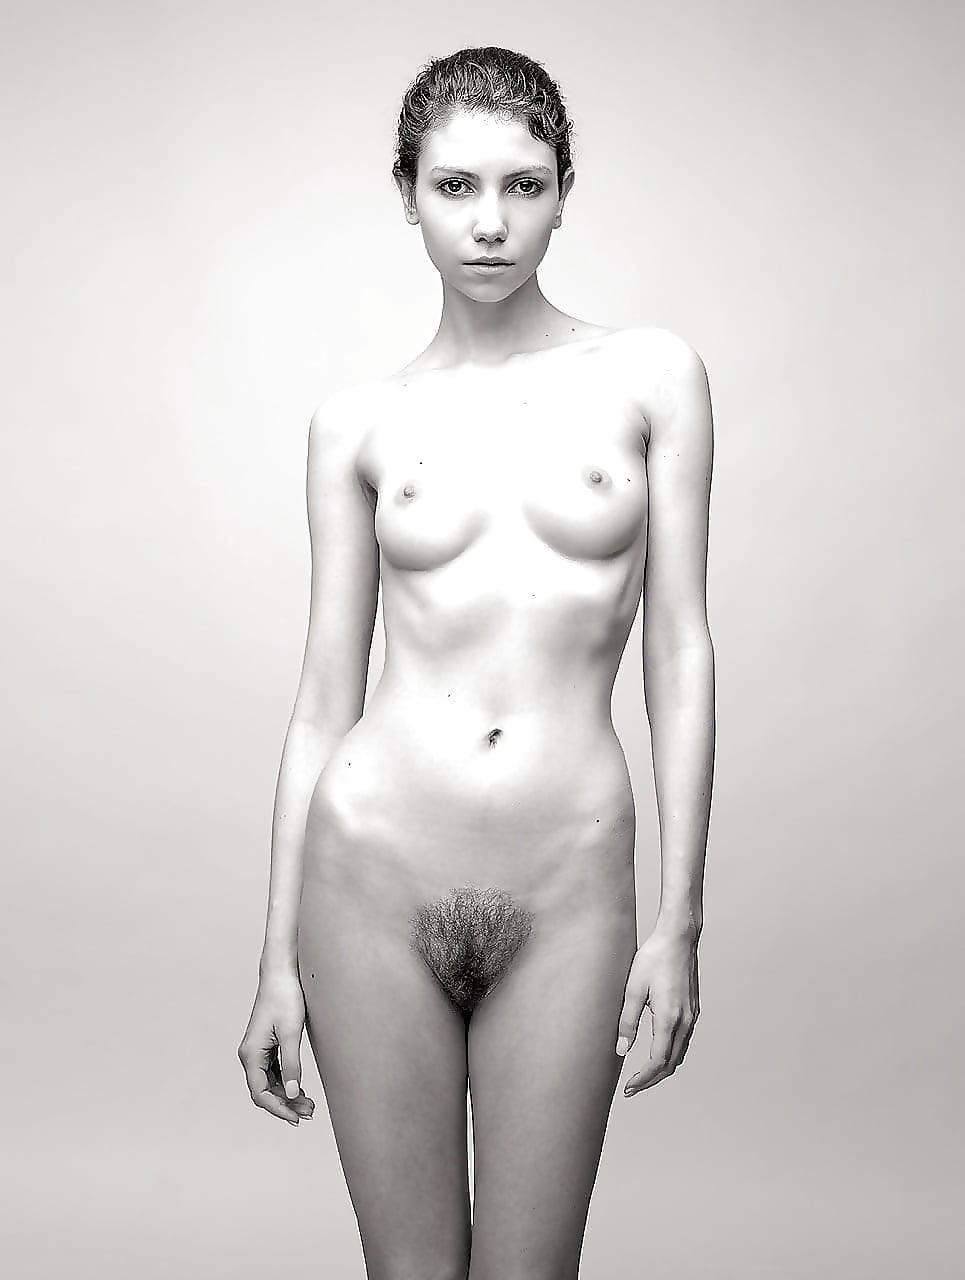 Hairy milfs sex pics, hot naked moms photos